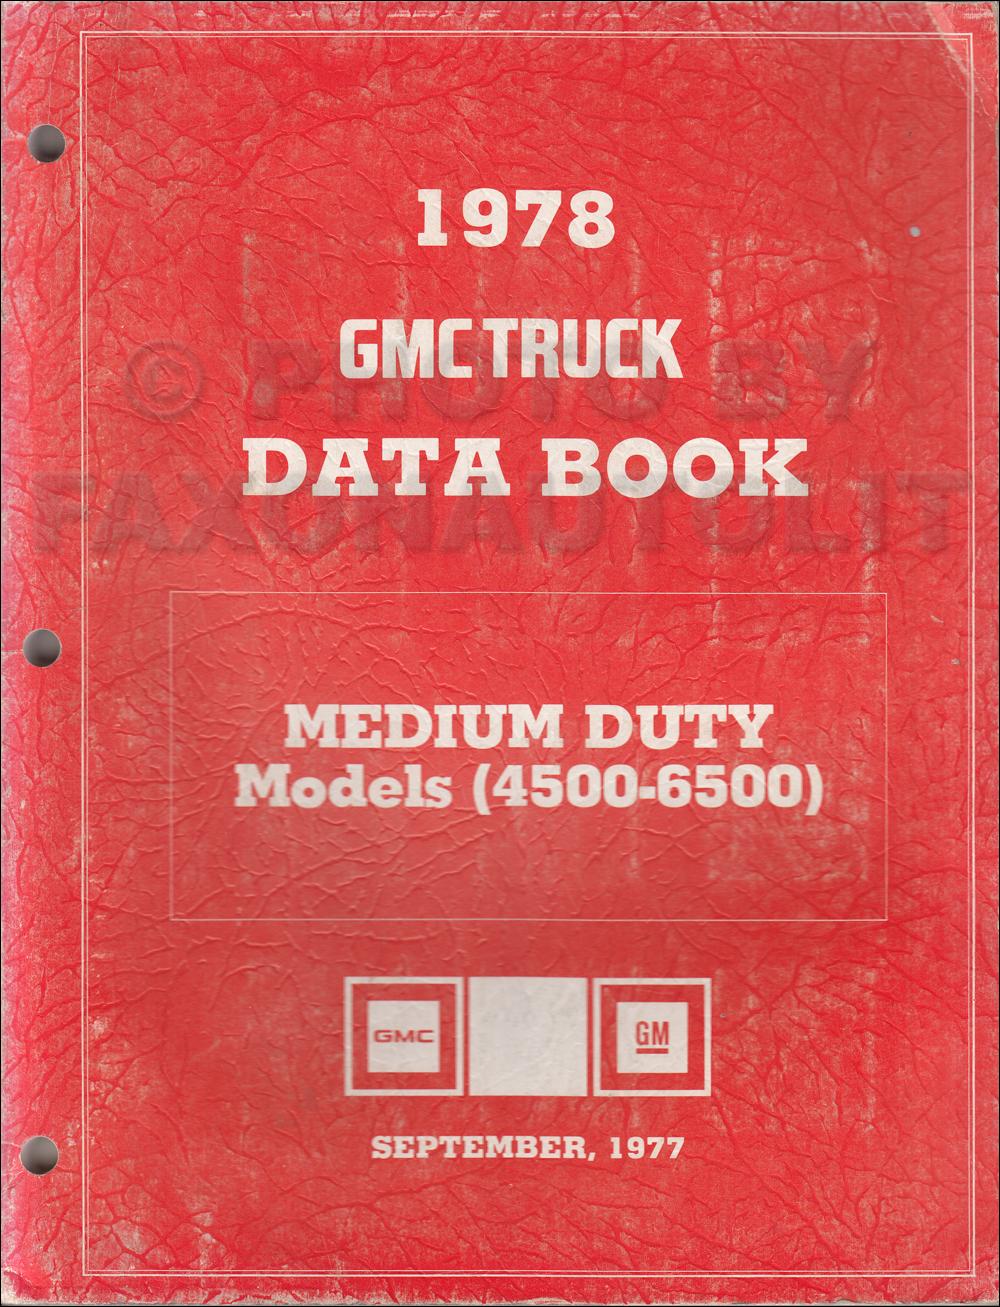 Electrical Wiring Diagram 1979 Gmc C60 Schematic Diagrams Cadillac 1978 Chevrolet And Medium